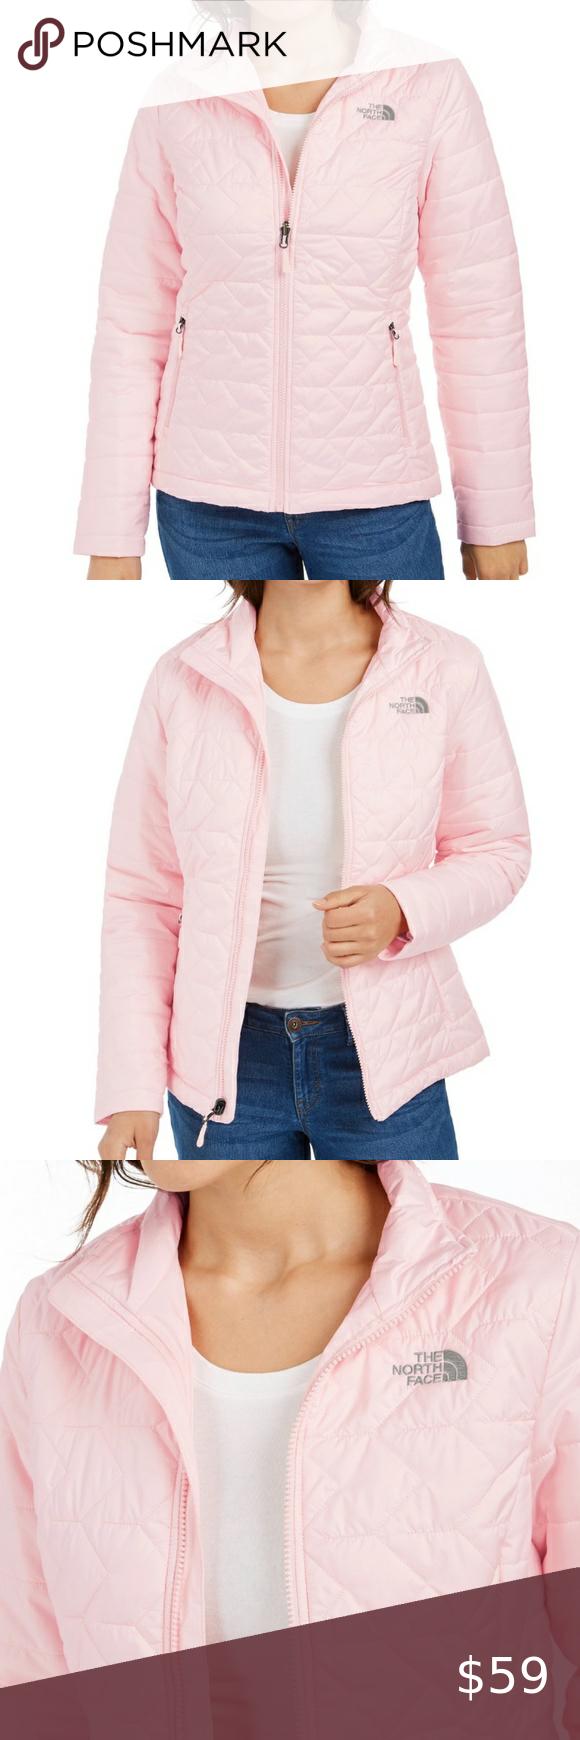 The North Face Tamburello Lightweight Pufferjacket The North Face Tamburello Pink Salt Lightweight J Lightweight Jacket Womens Jackets For Women The North Face [ 1740 x 580 Pixel ]